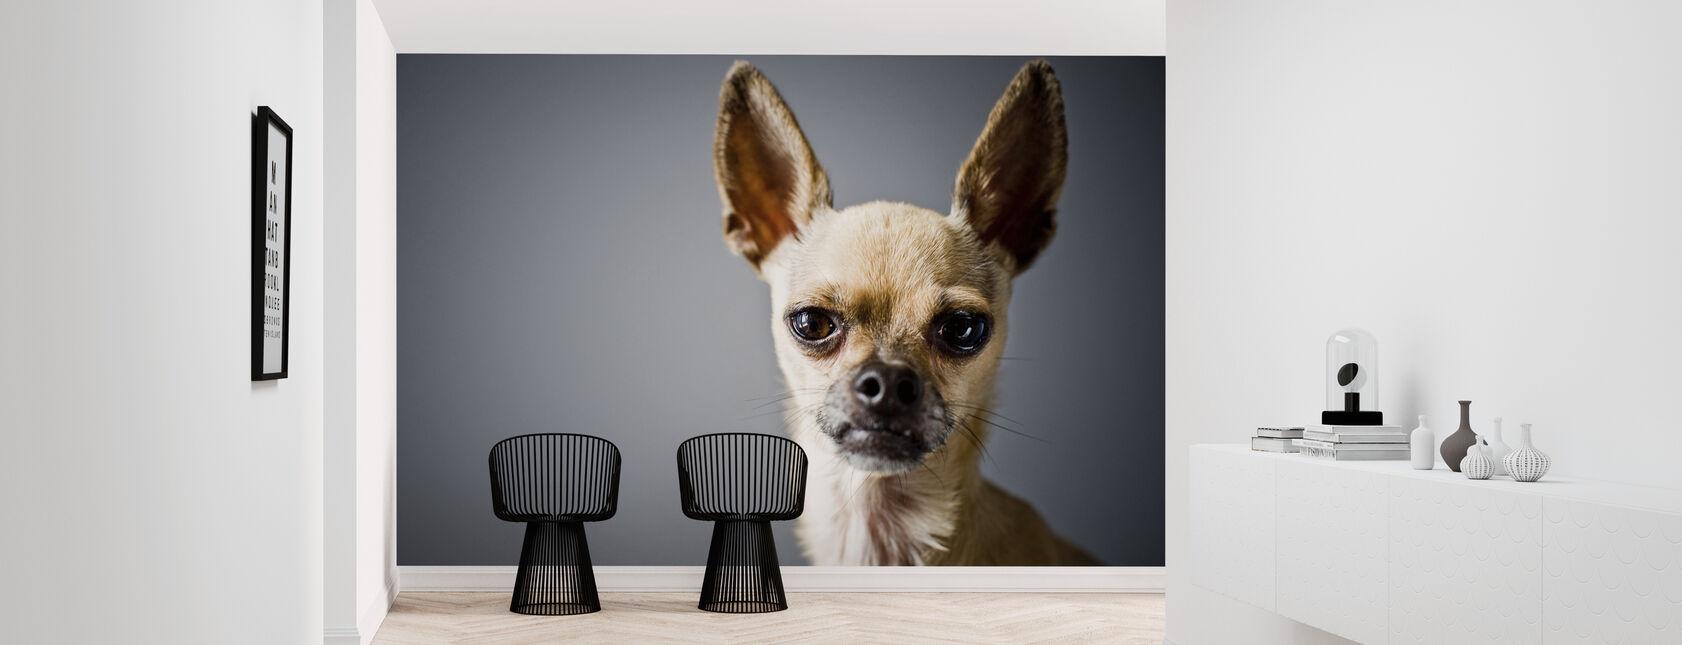 Chihuahua Nachahmung Lama - Tapete - Flur